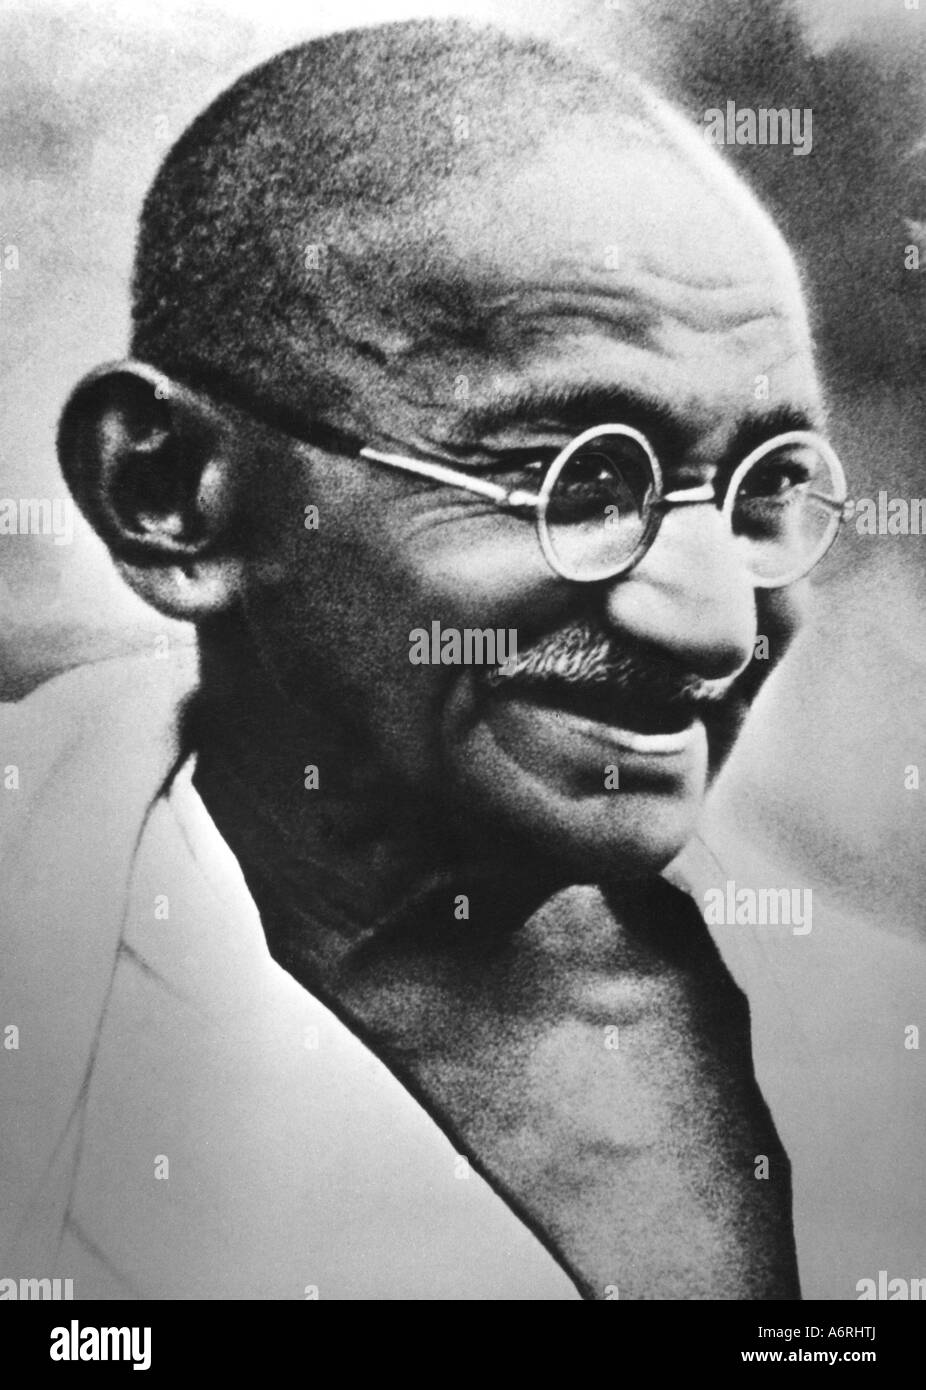 Gandhi, Mohandas Karamchand, genannt Mahatma, 2.10.1869 - 30.1.1948, indischer Politiker, Porträt, ca. 1940, Stockbild